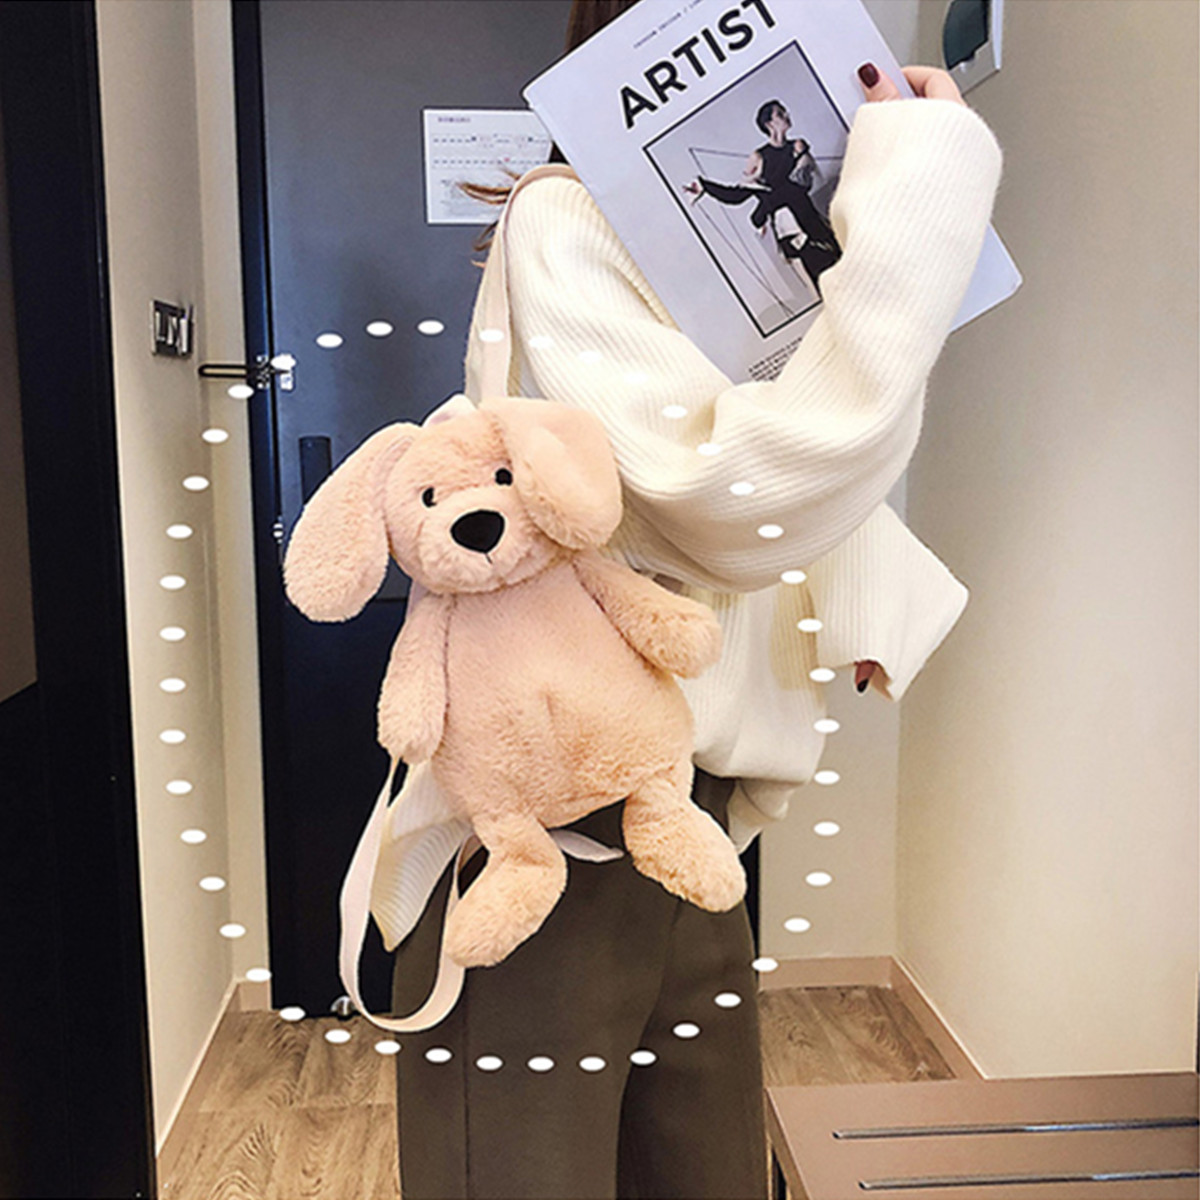 Cute Puppy Cartoon Plush Backpack Bag Women Cartoon Dog Back Pack Fluffy Animal Shoulder Bag Stuffed Toy Children baby gift